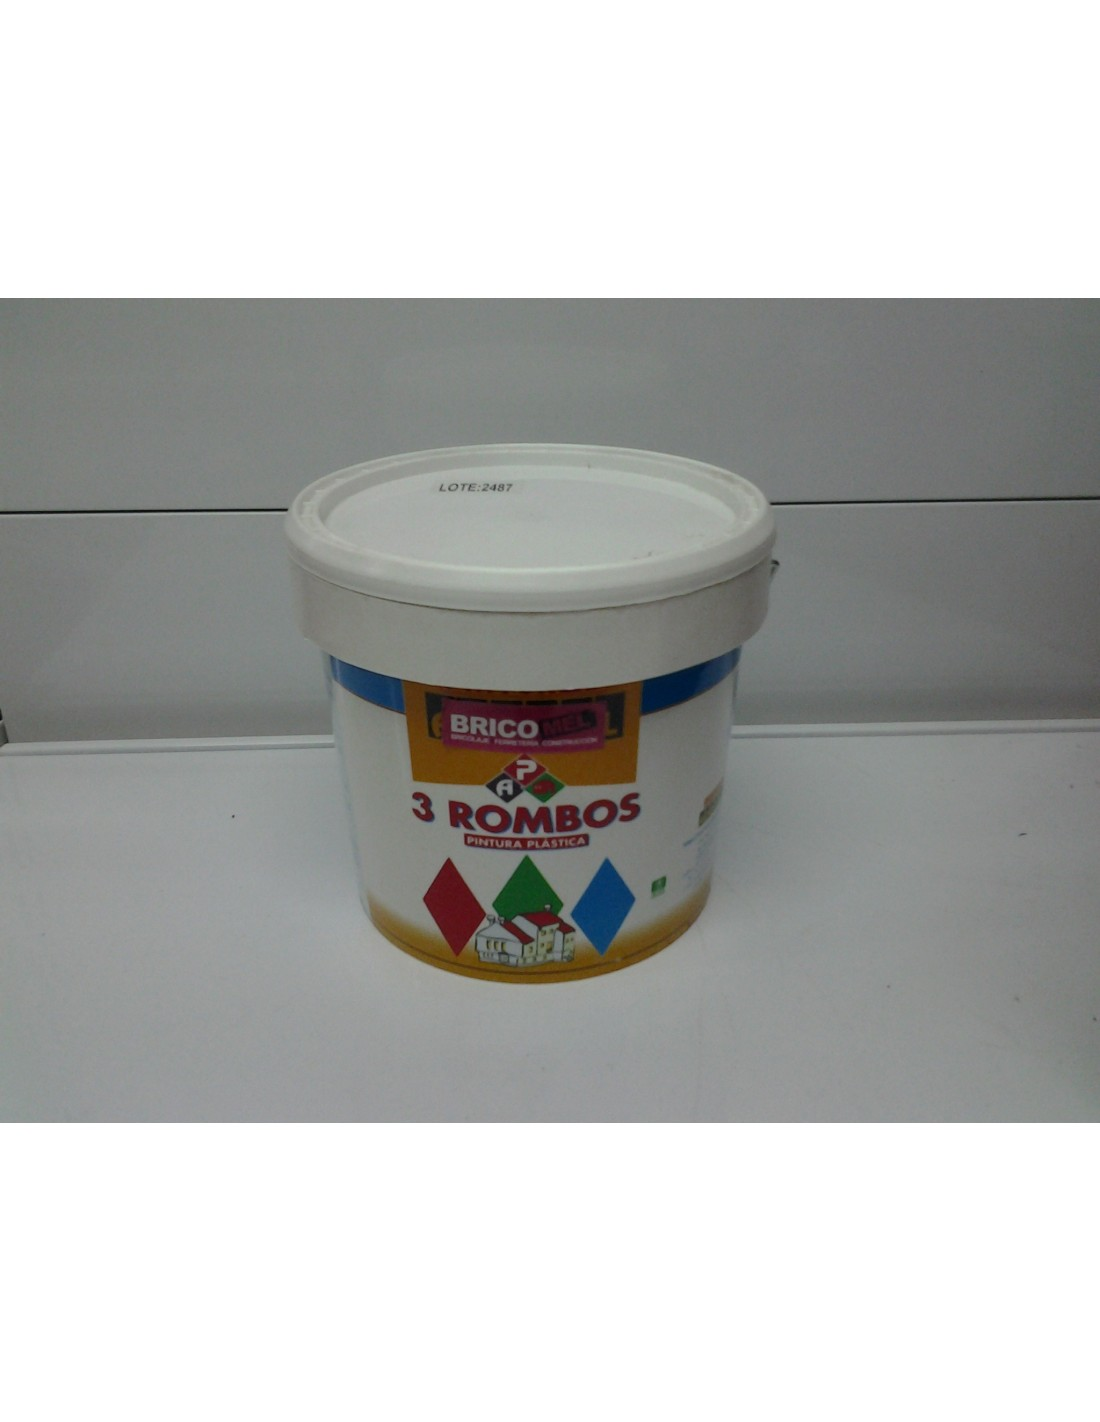 Pintura plastica blanca mate 3 rombos 3 lts bricomel - Pintura plastica blanca ...